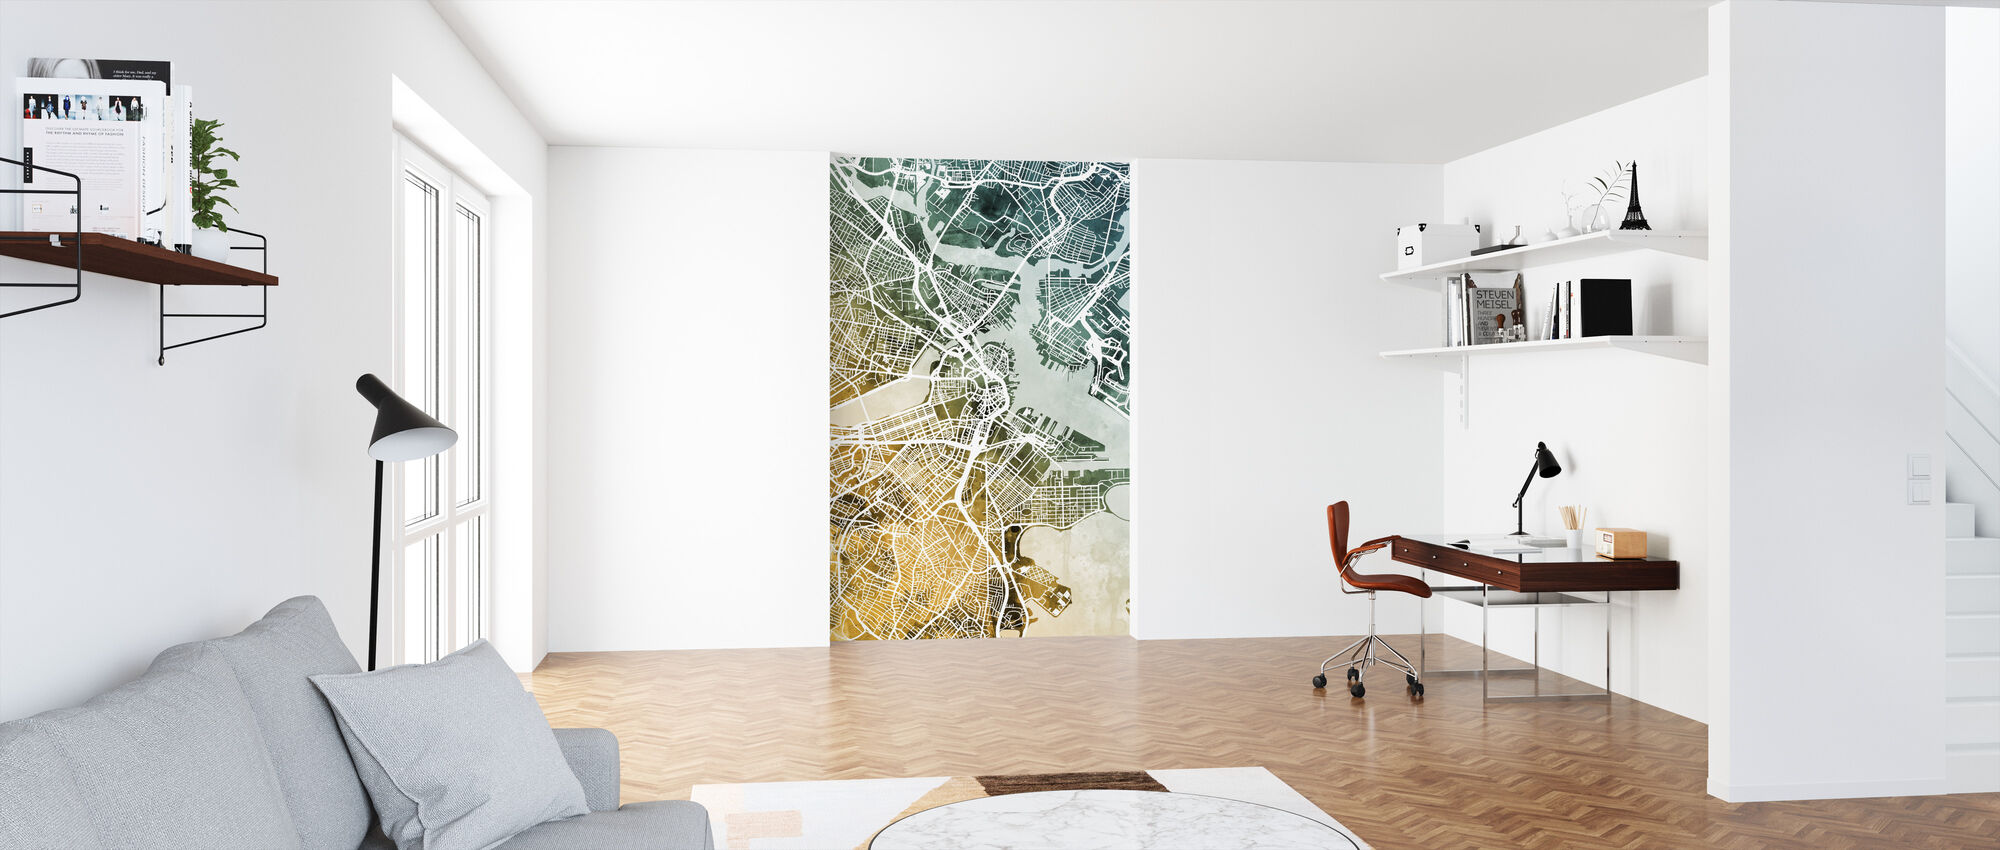 Boston Massachusetts Street Map - Wallpaper - Office